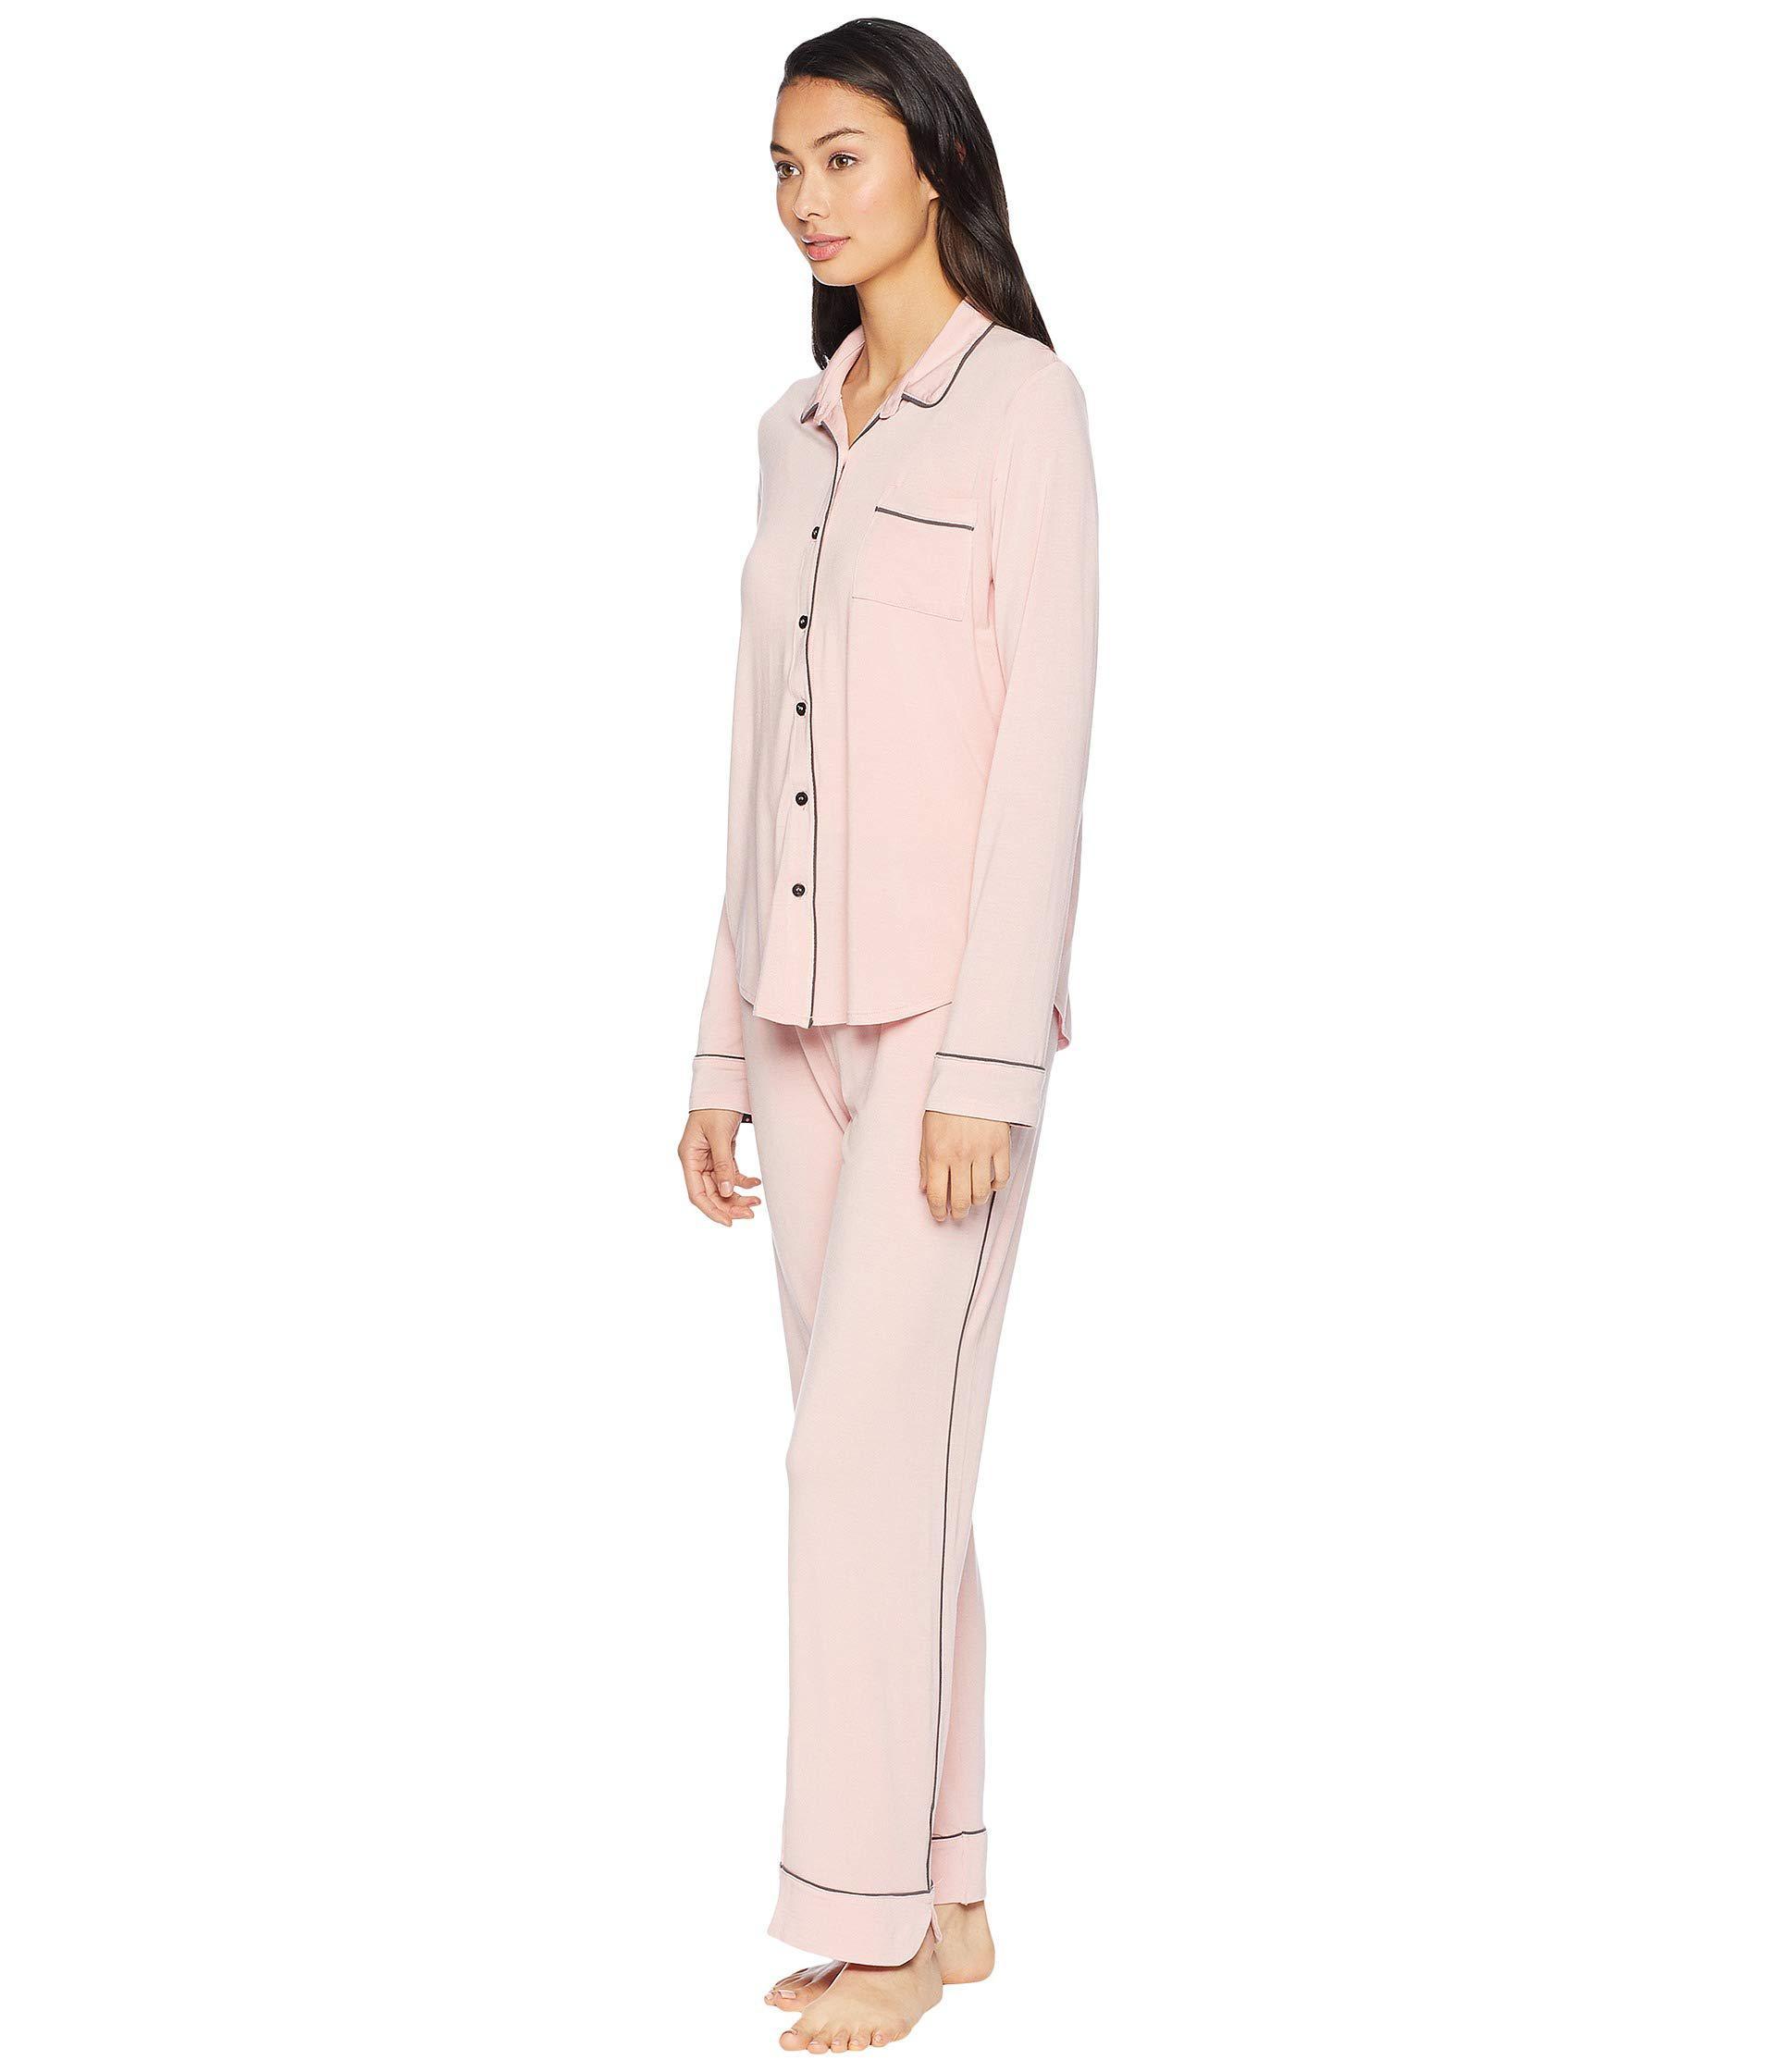 e01150e098 Lyst - Pj Salvage Modal Basic Pj Set With Eye Mask (black) Women s Pajama  Sets in Pink